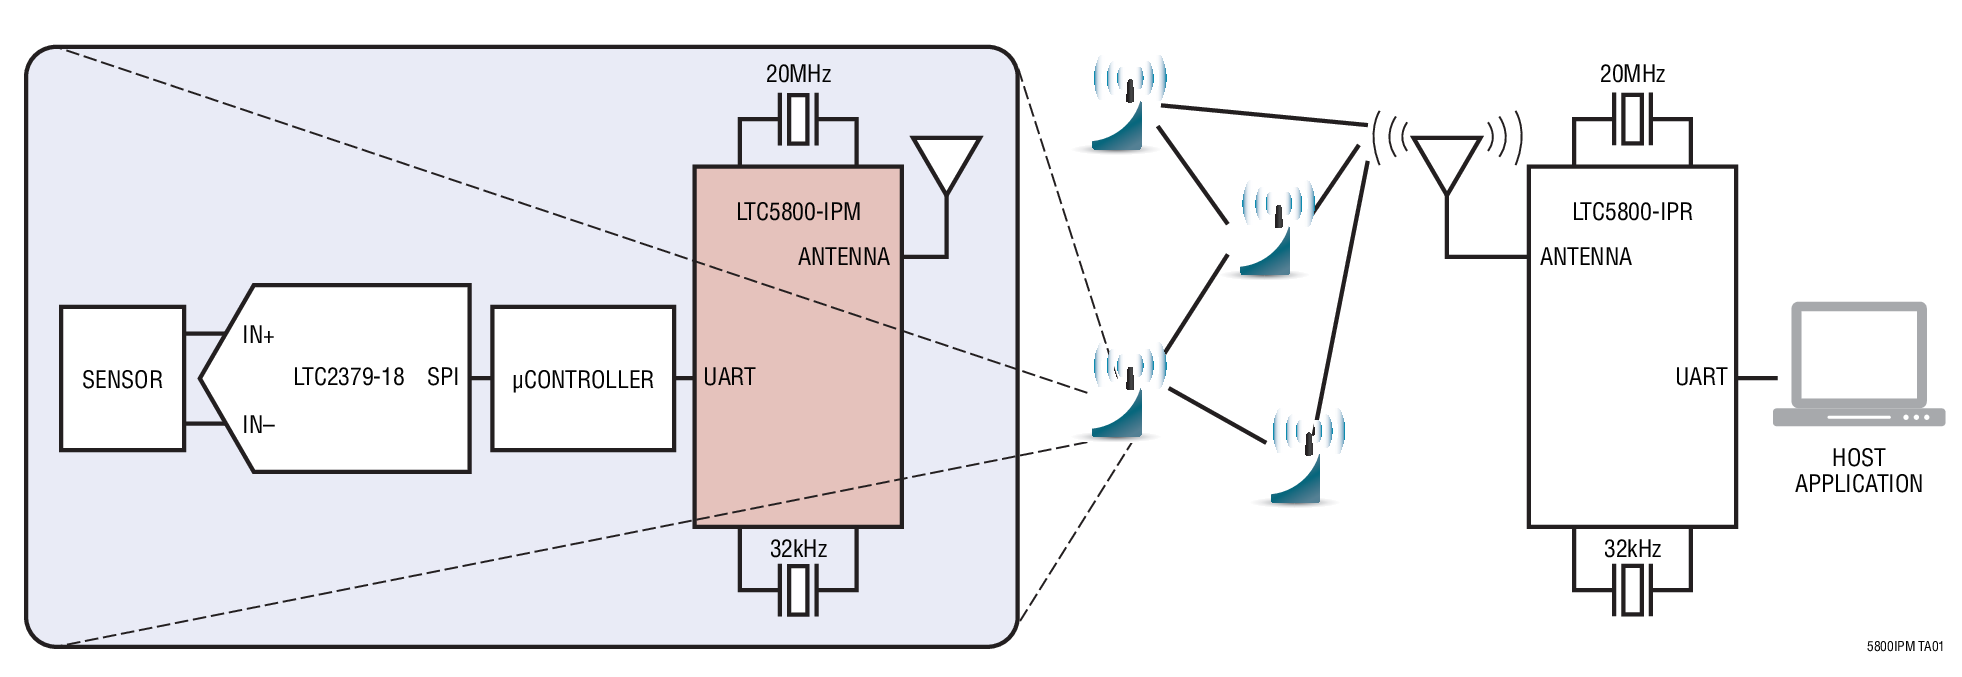 SmartMesh IP™ 无线传感器网络是自我管理式的低功耗互联网协议 (IP) 网络,其采用被称为微尘(Mote) 的无线节点构建而成。LTC5800-IPM 是 Eterna* 系列 IEEE 802.15.4e 片上系统 (SoC) 解决方案中的 IP 微尘产品,其运用了一种由 Dust Networks 完成的高集成度、低功耗无线电设计,以及一个用于运行 Dust 嵌入式 SmartMesh IP 网络软件的 ARM Cortex-M3 32 位微处理器。 LTC5800-IPM